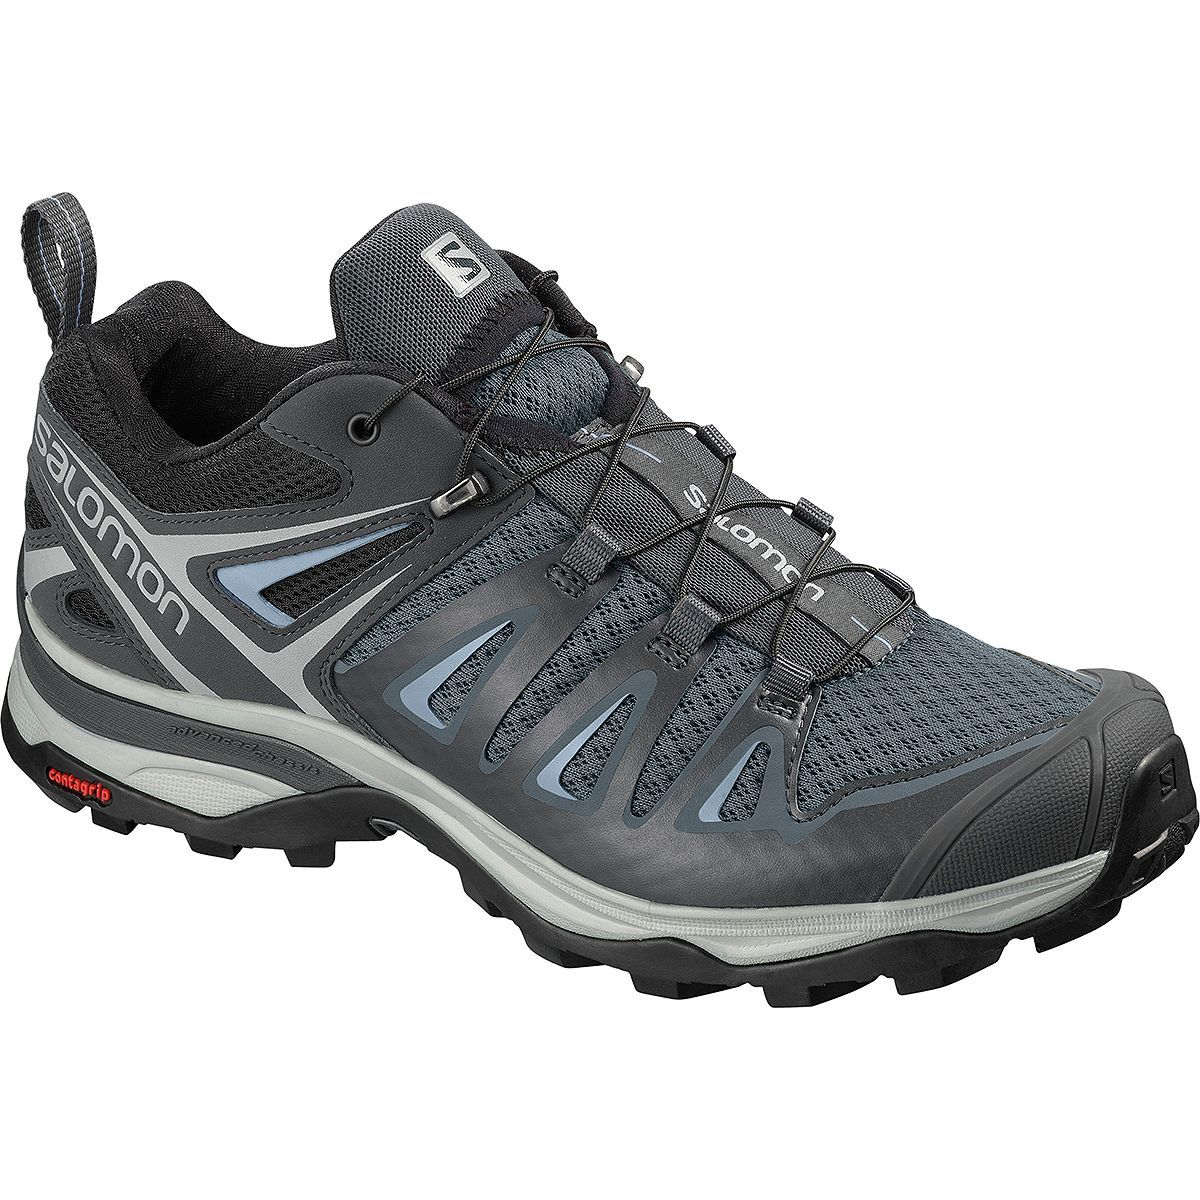 X Ultra 3 Hiking Shoe - Women's #womenvest